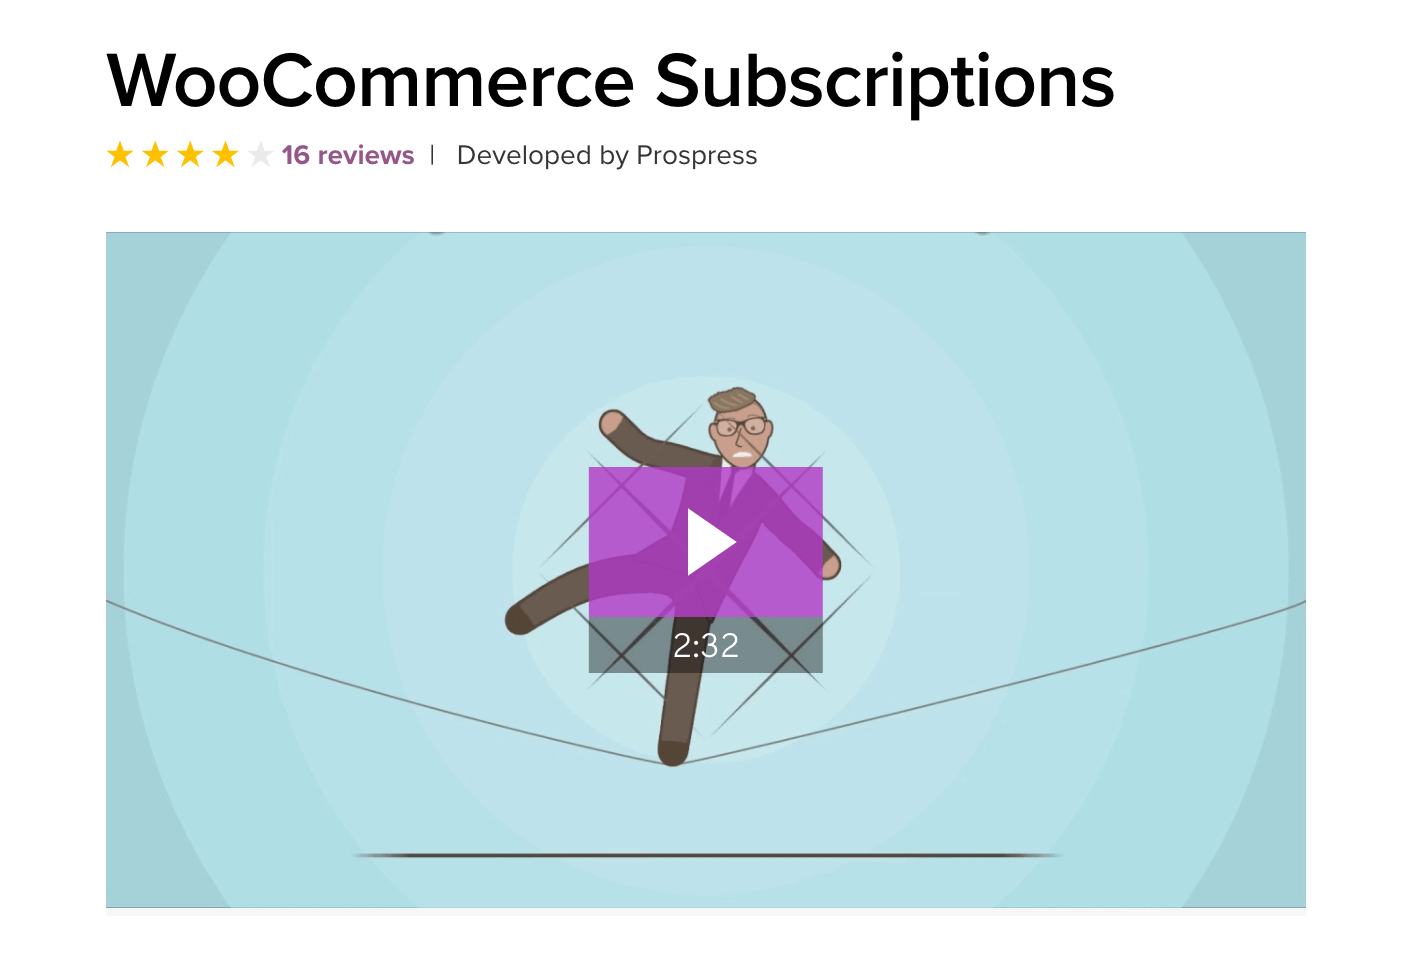 L'extension WooCommerce Subscriptions